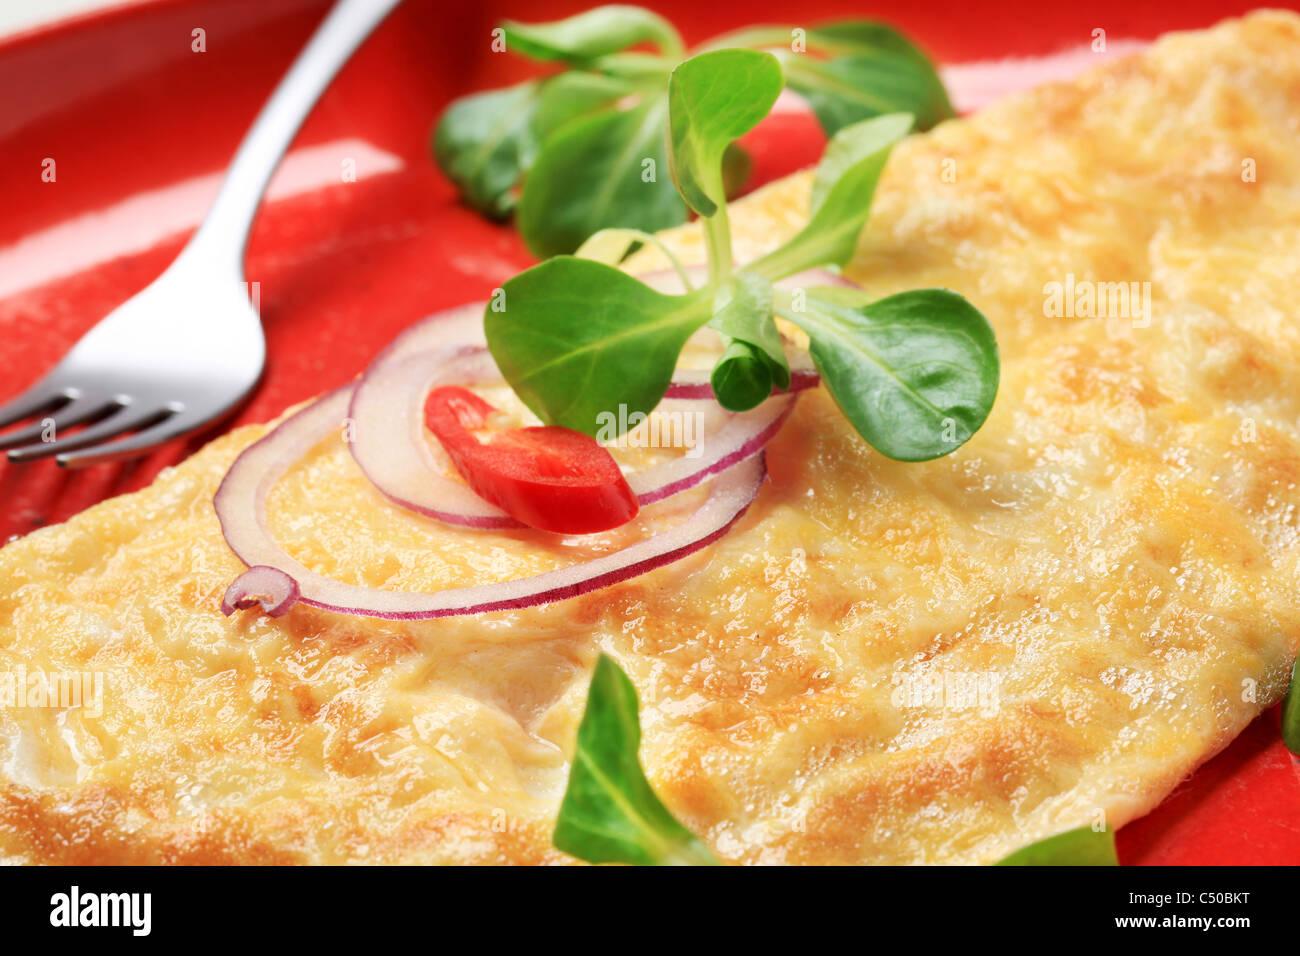 Egg omelet sprinkled with fresh salad greens - Stock Image